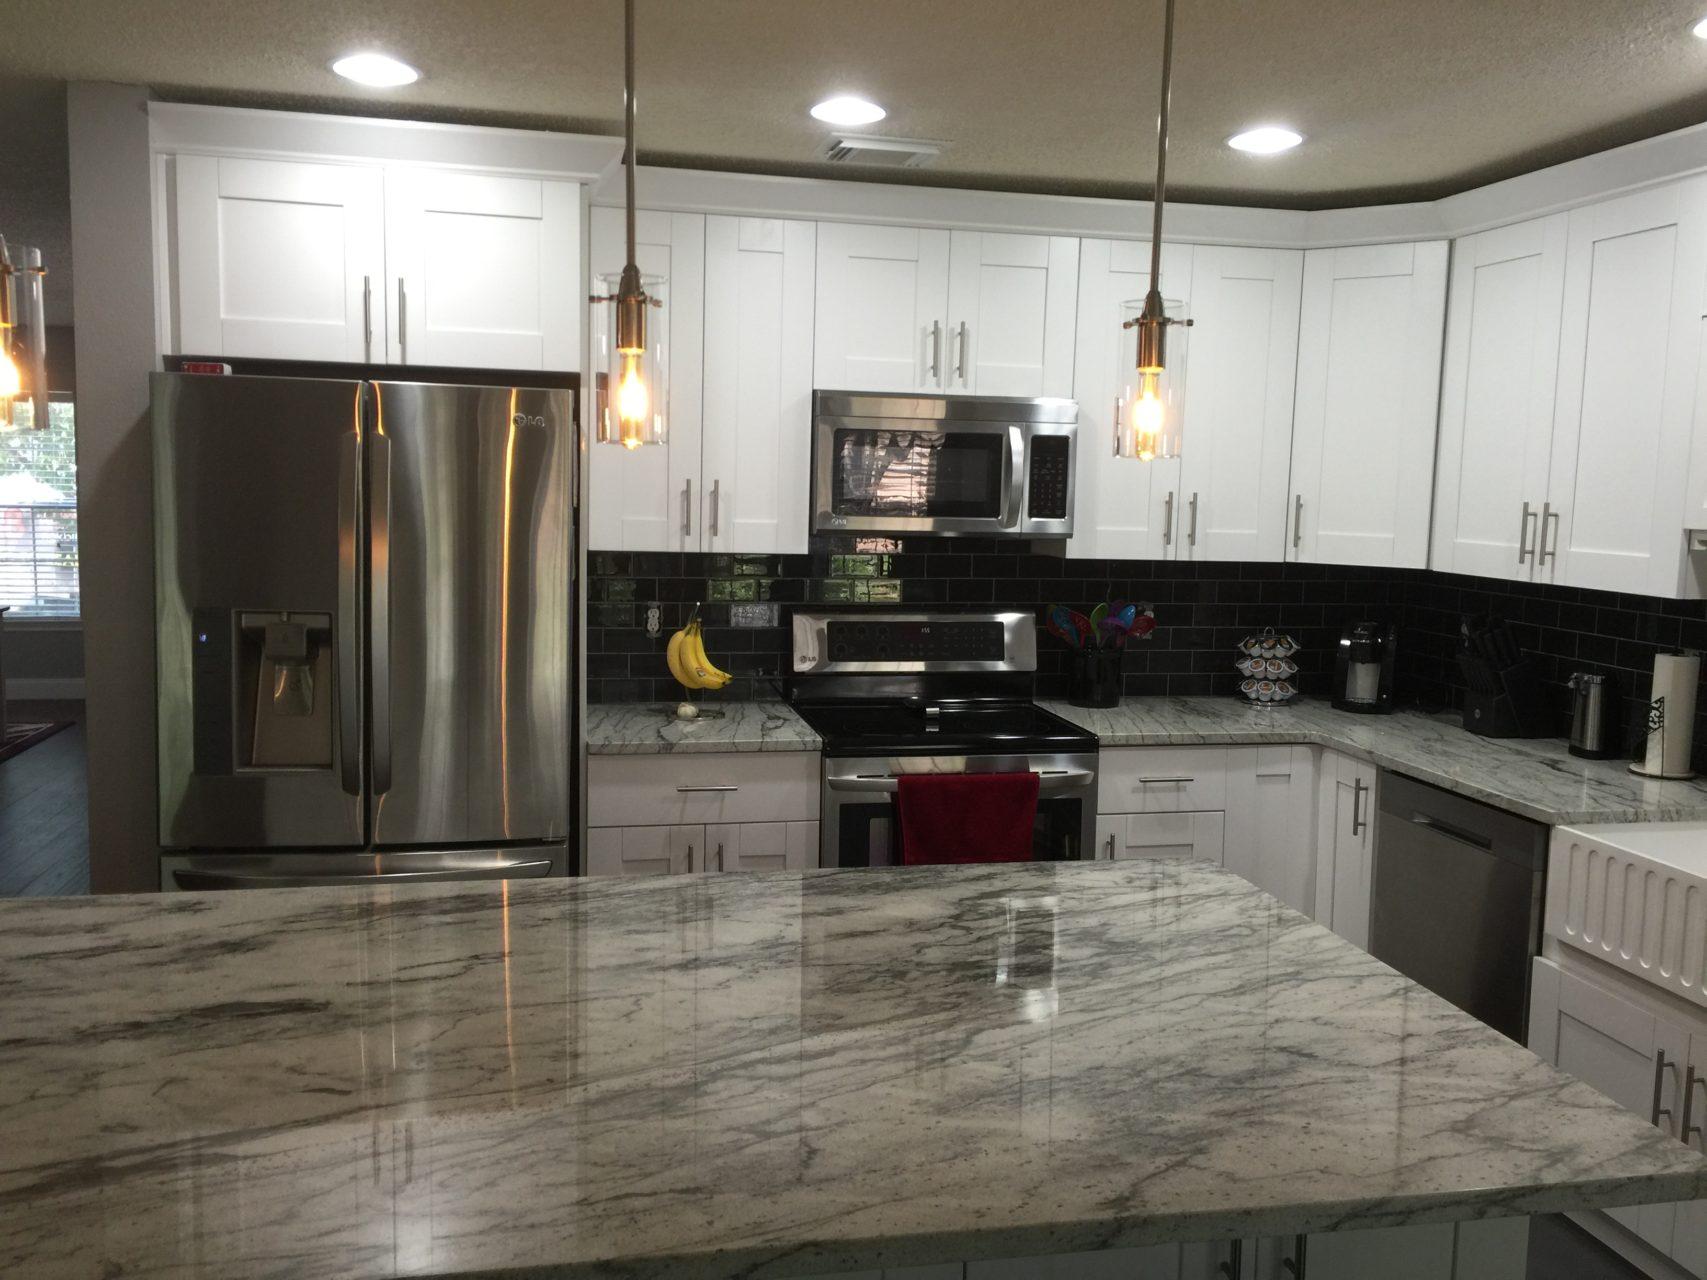 Shavano Park Kitchen Remodeling Project San Antonio Kitchen Cabinets